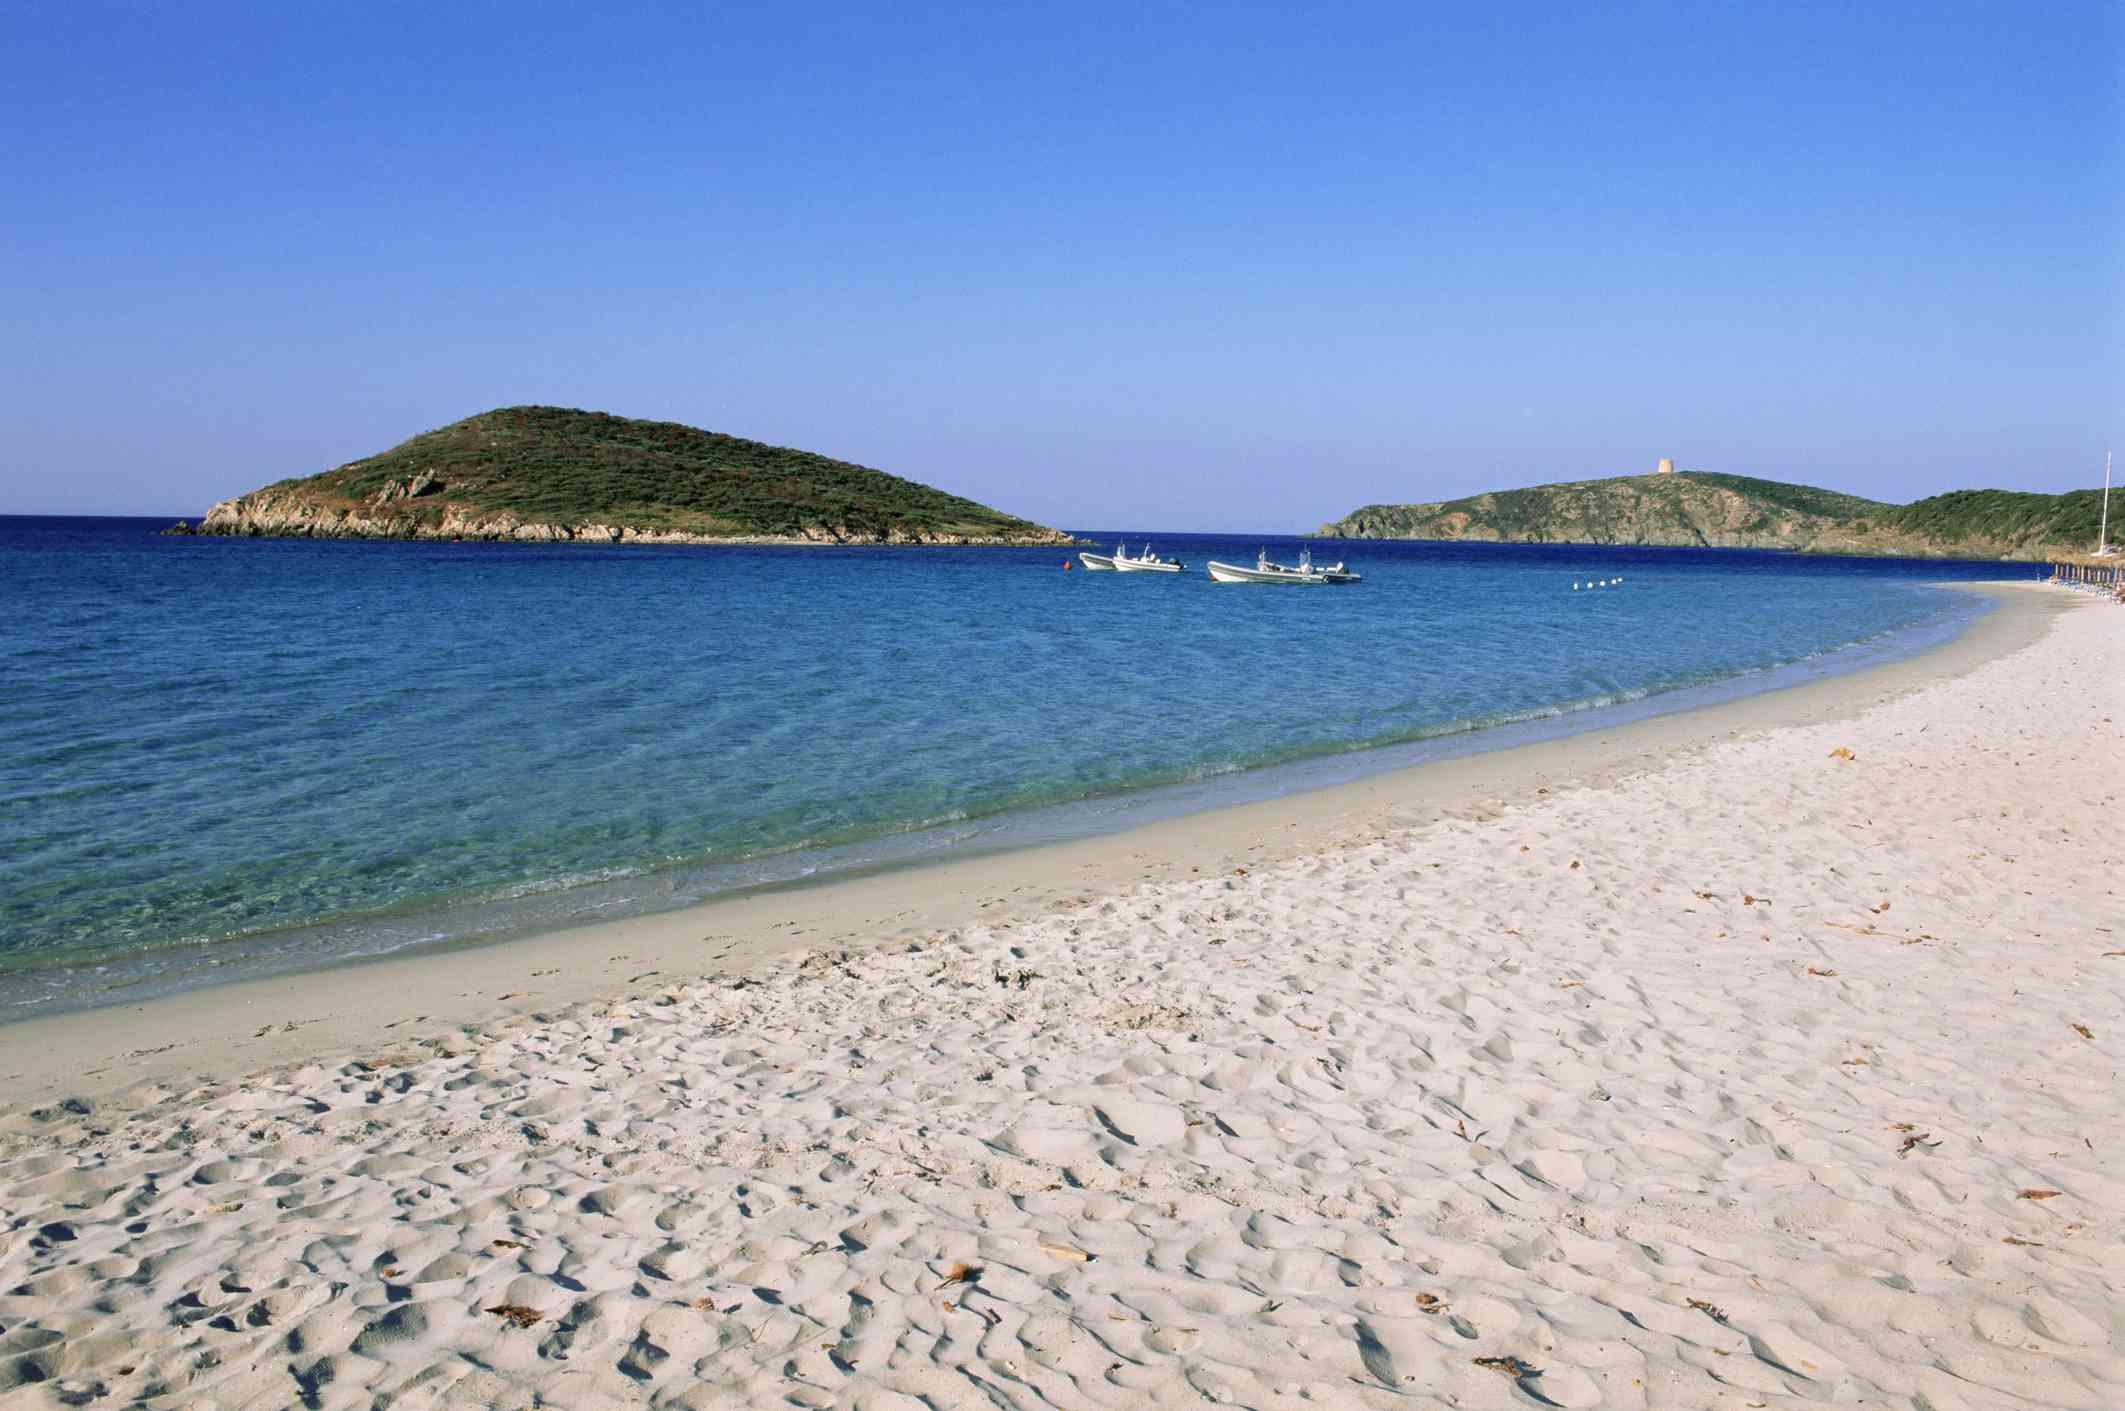 Beach along the Chia Coast, Sardinia